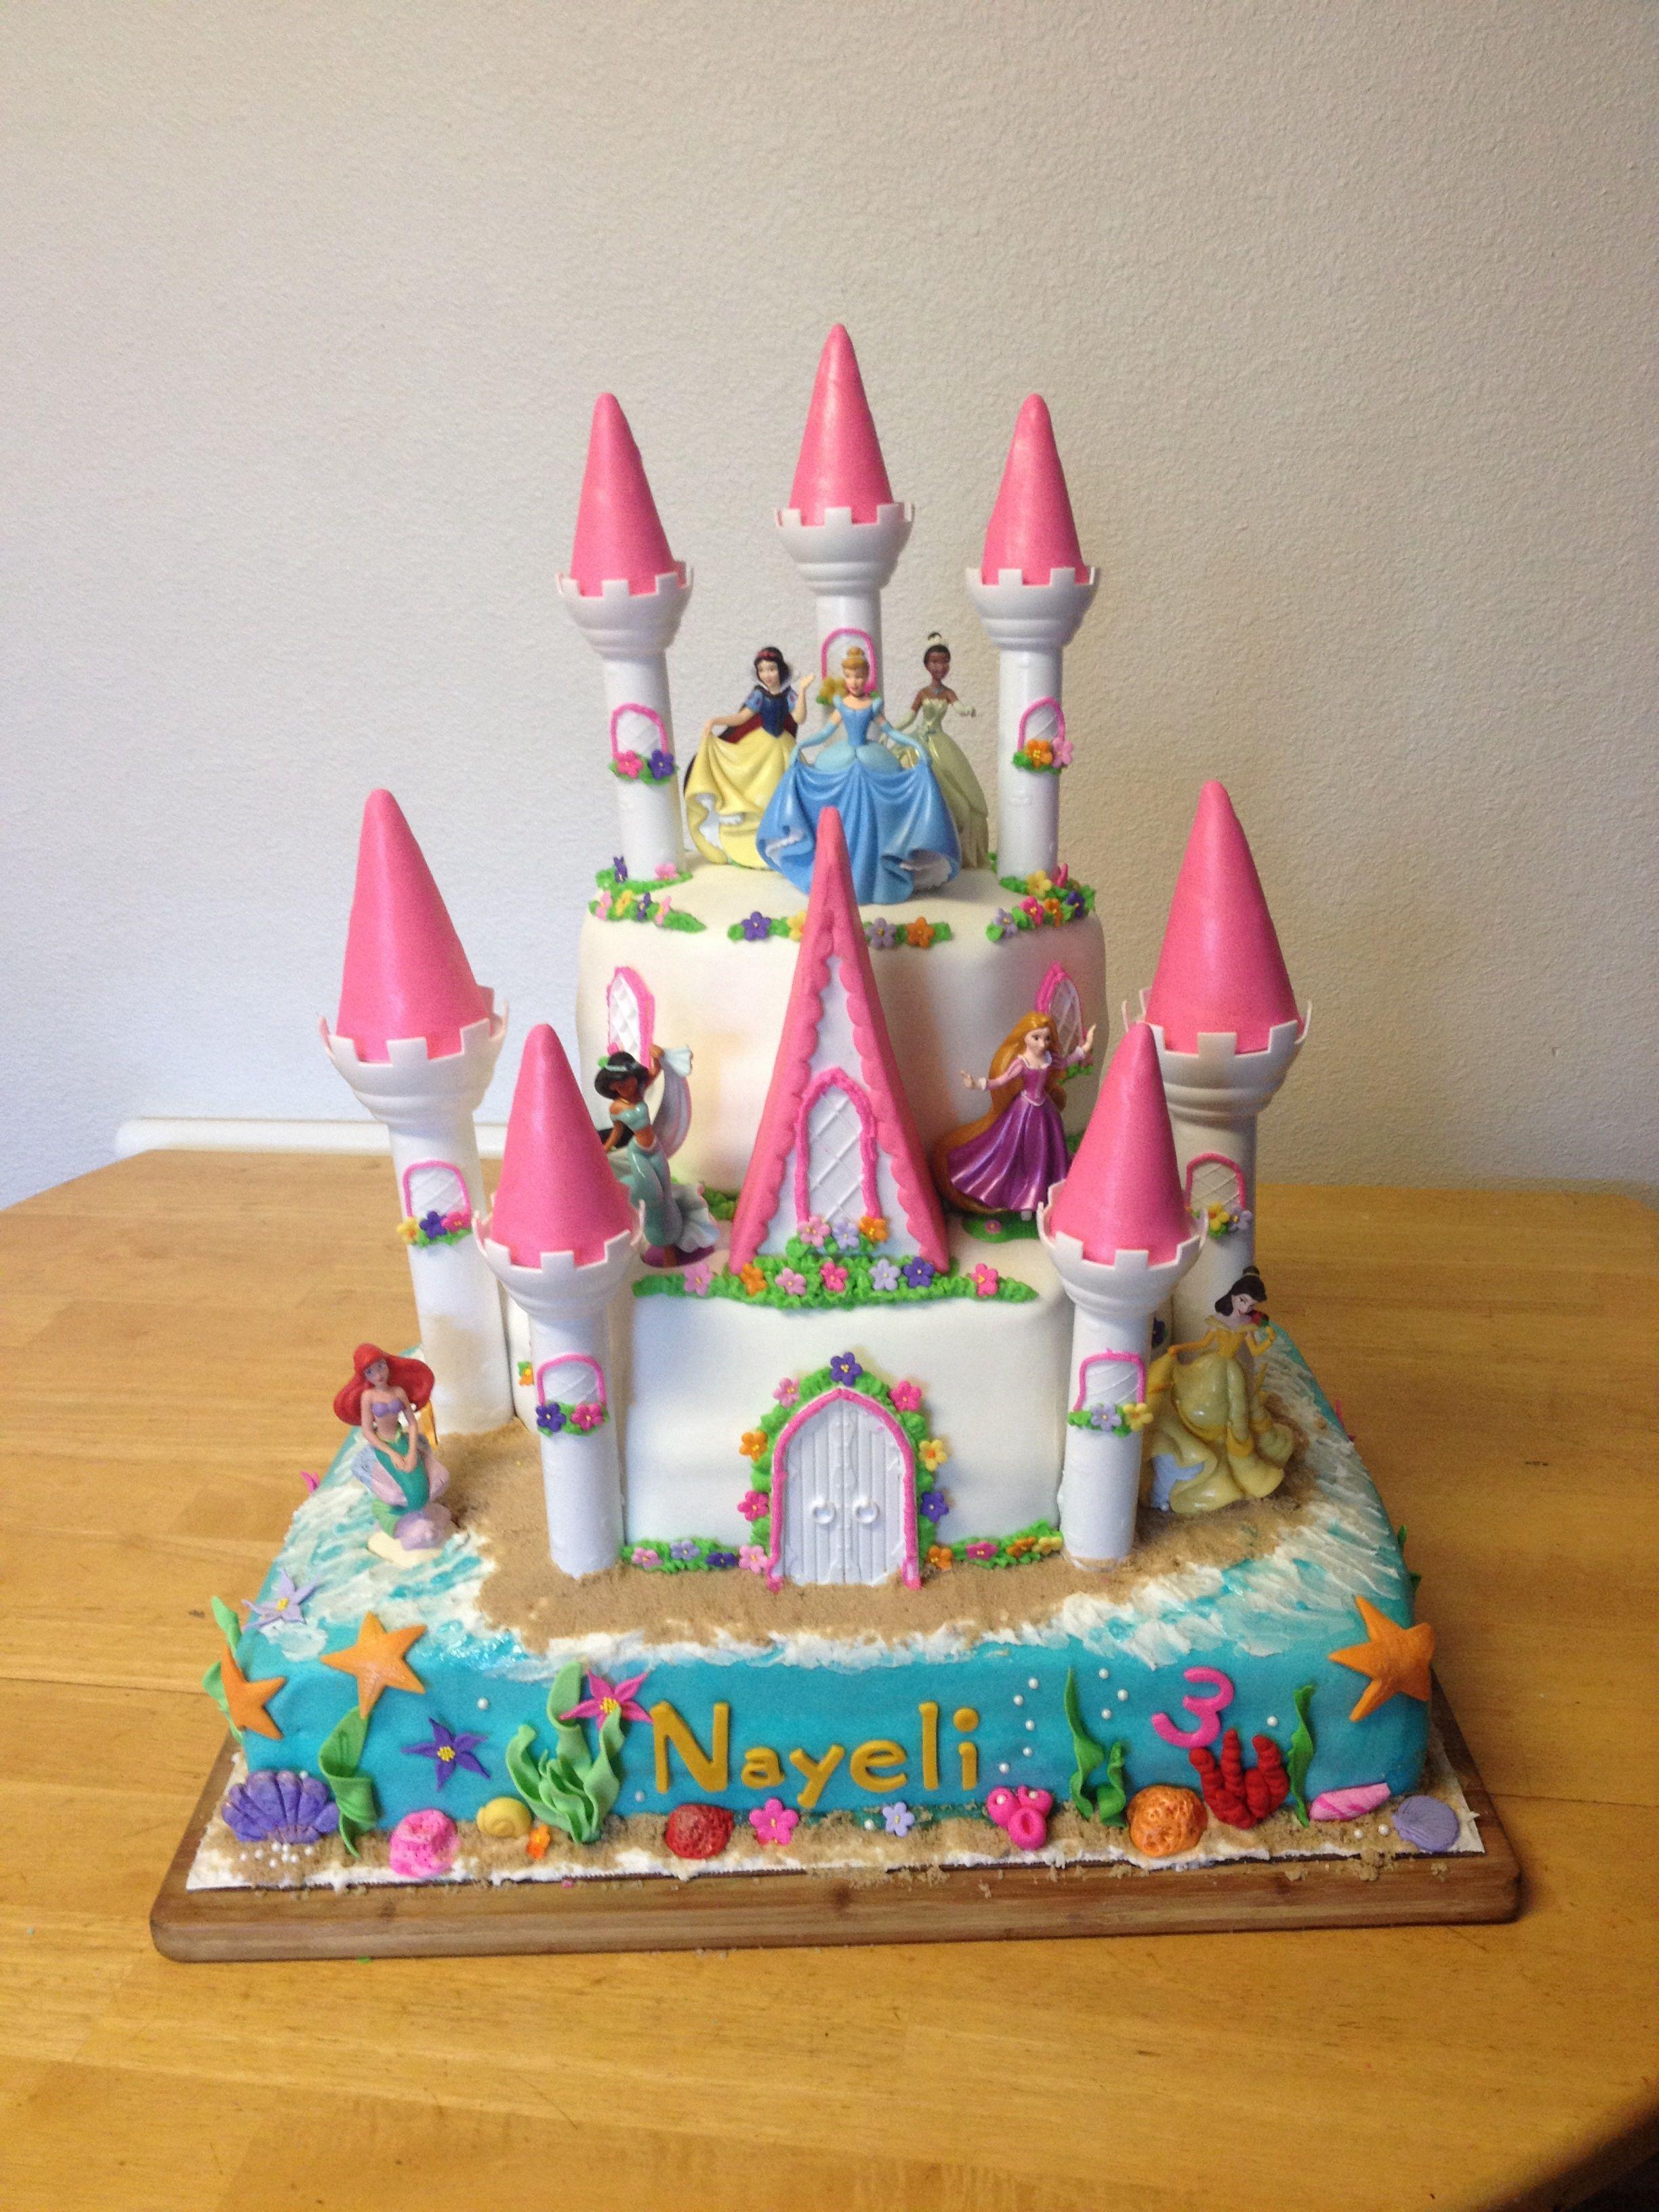 Disney Princess Birthday Cake And Cupcakes I Made For My